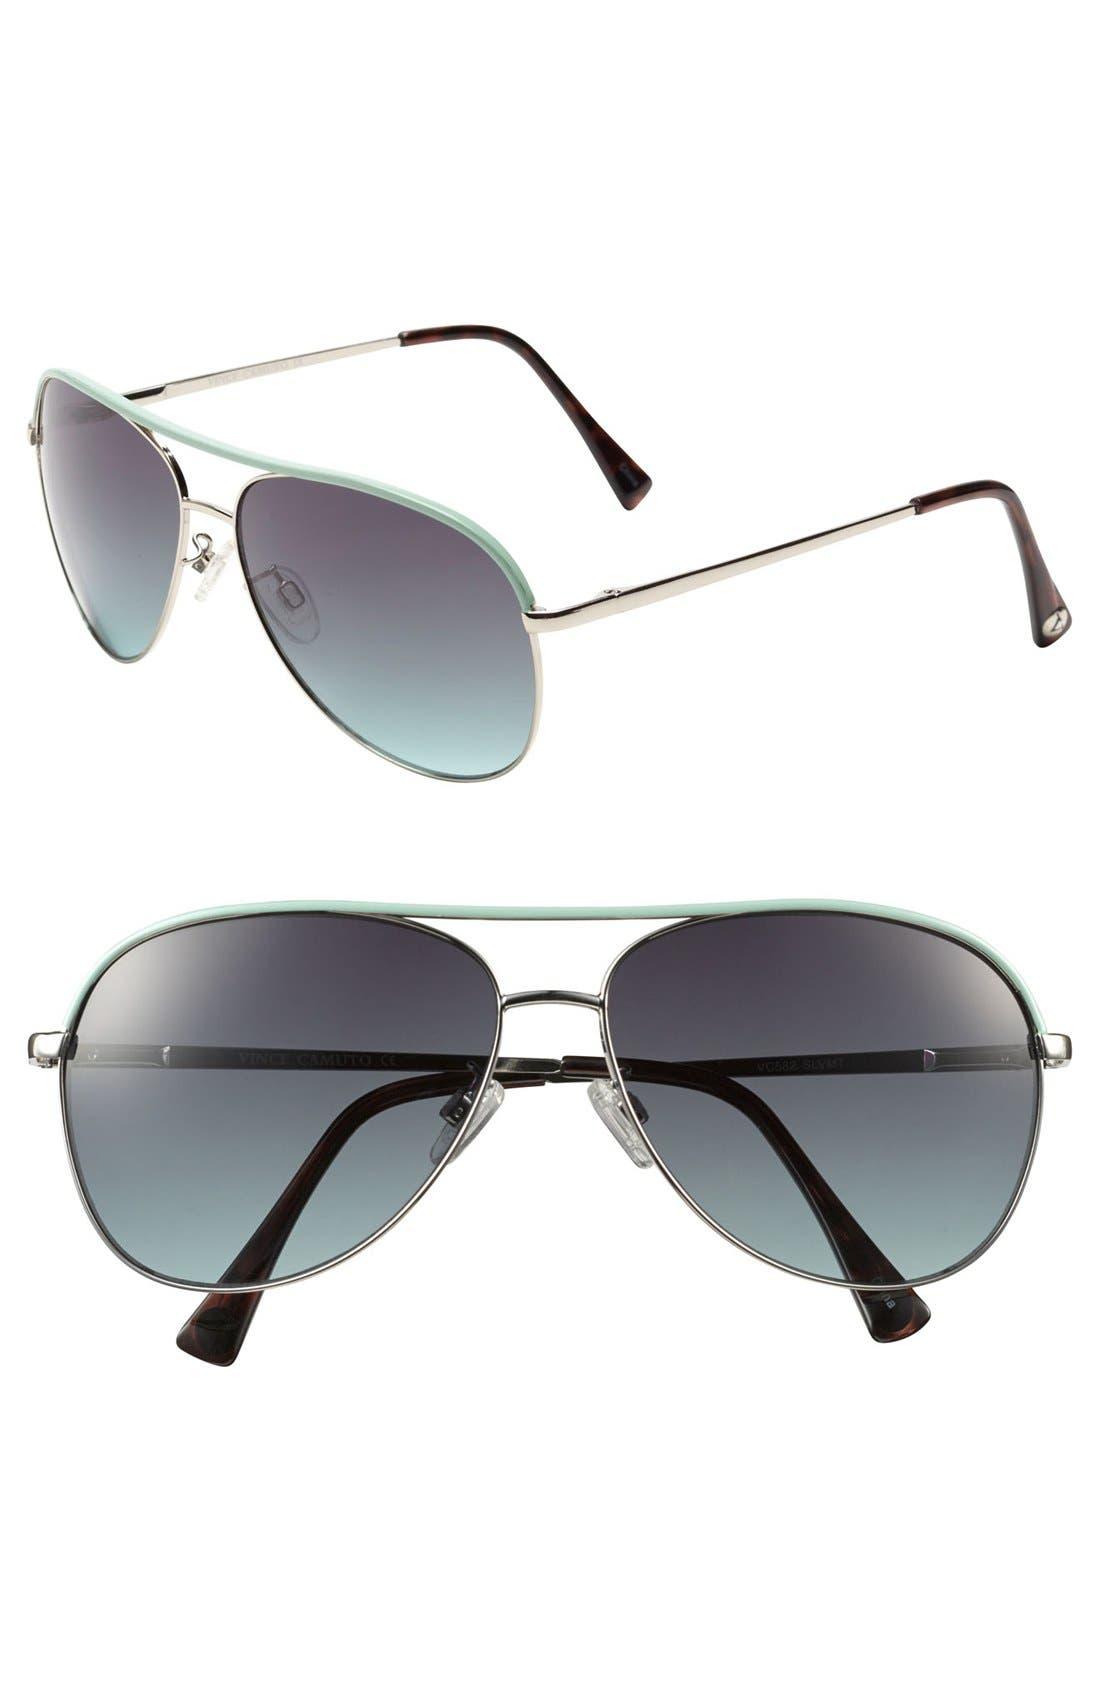 Main Image - Vince Camuto 59mm Metal Aviator Sunglasses